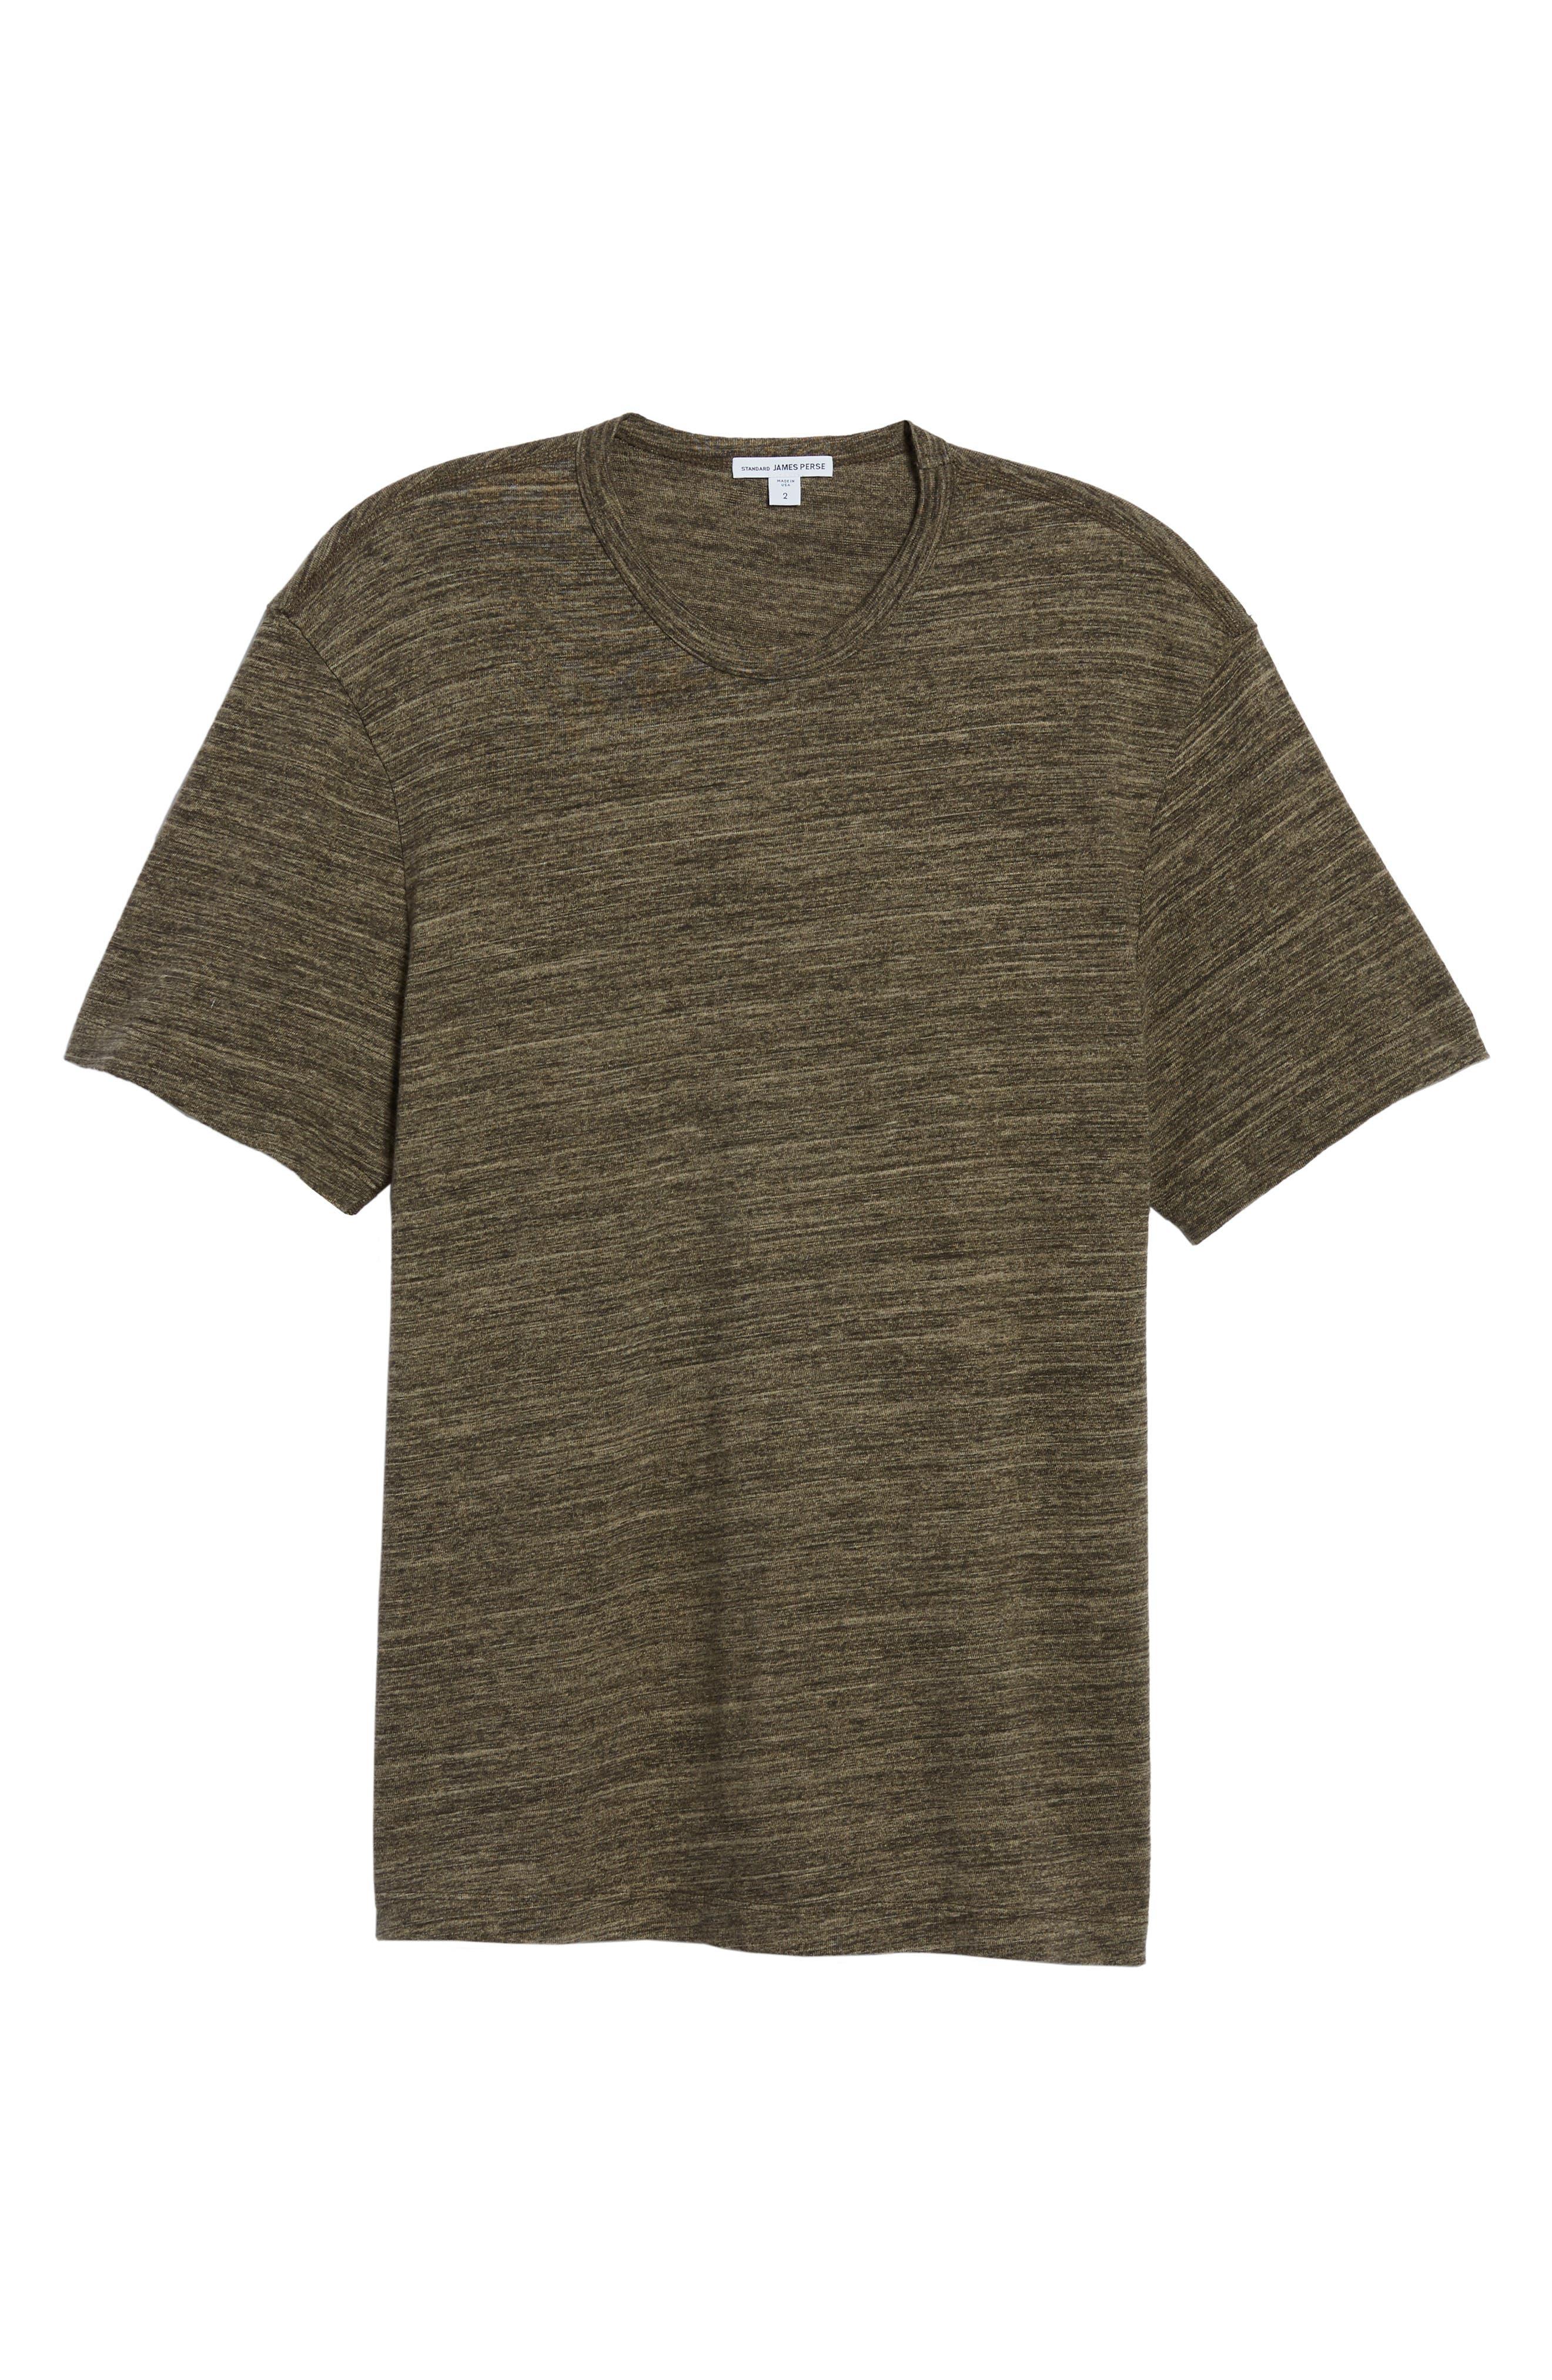 Regular Fit Top Dyed Crewneck T-Shirt,                             Alternate thumbnail 18, color,